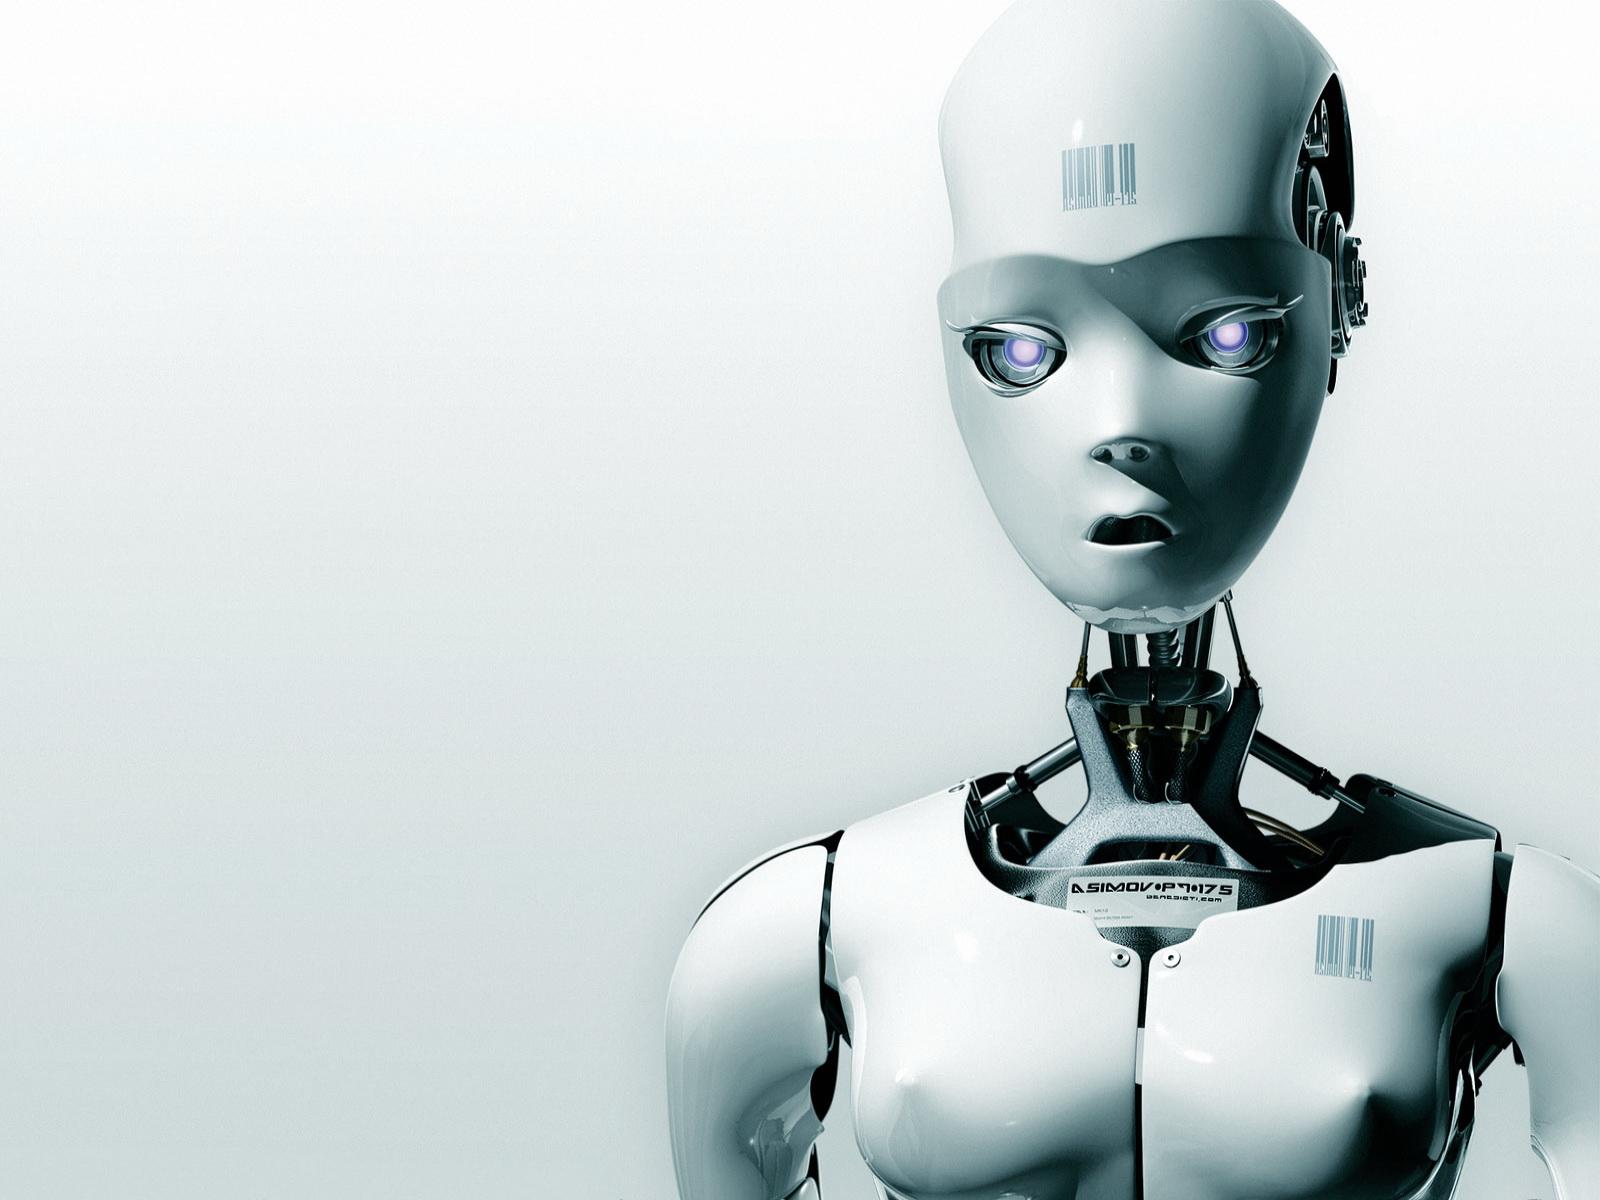 http://1.bp.blogspot.com/-inwpzcL9U4k/T-yIFA6ETDI/AAAAAAAAAiA/U40QcATWbQs/s1600/robot-android+HD+Wallpaper+hd+.jpg